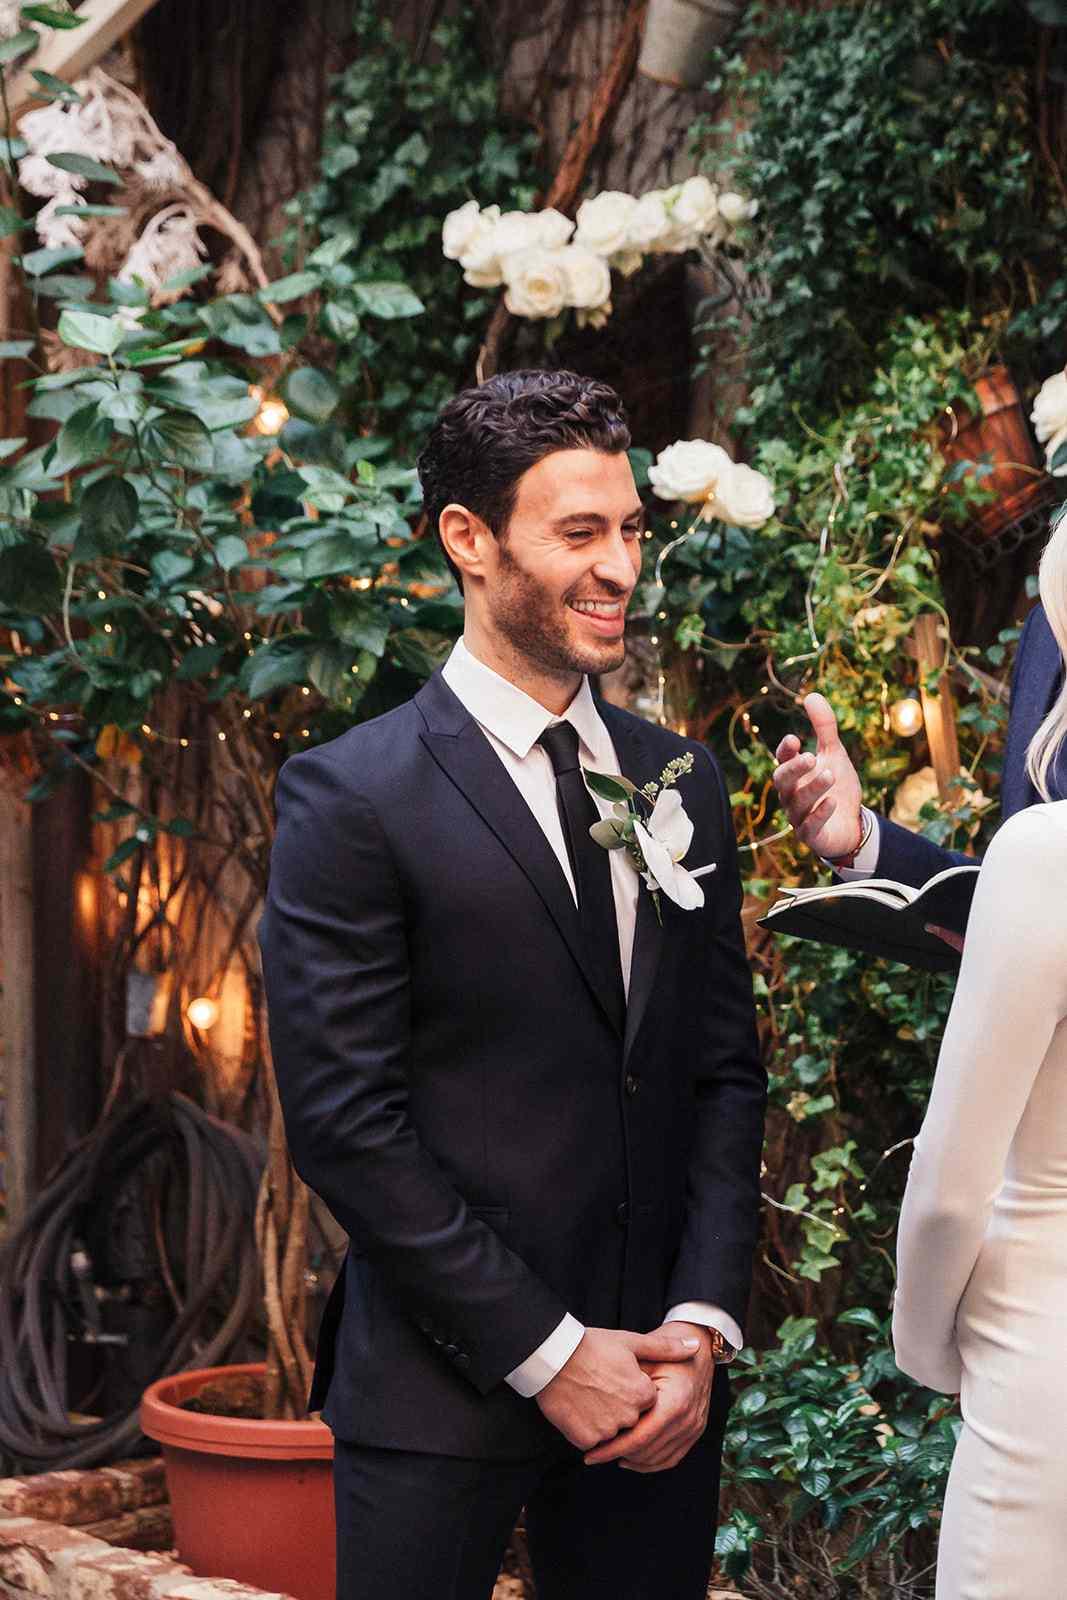 groom at ceremony